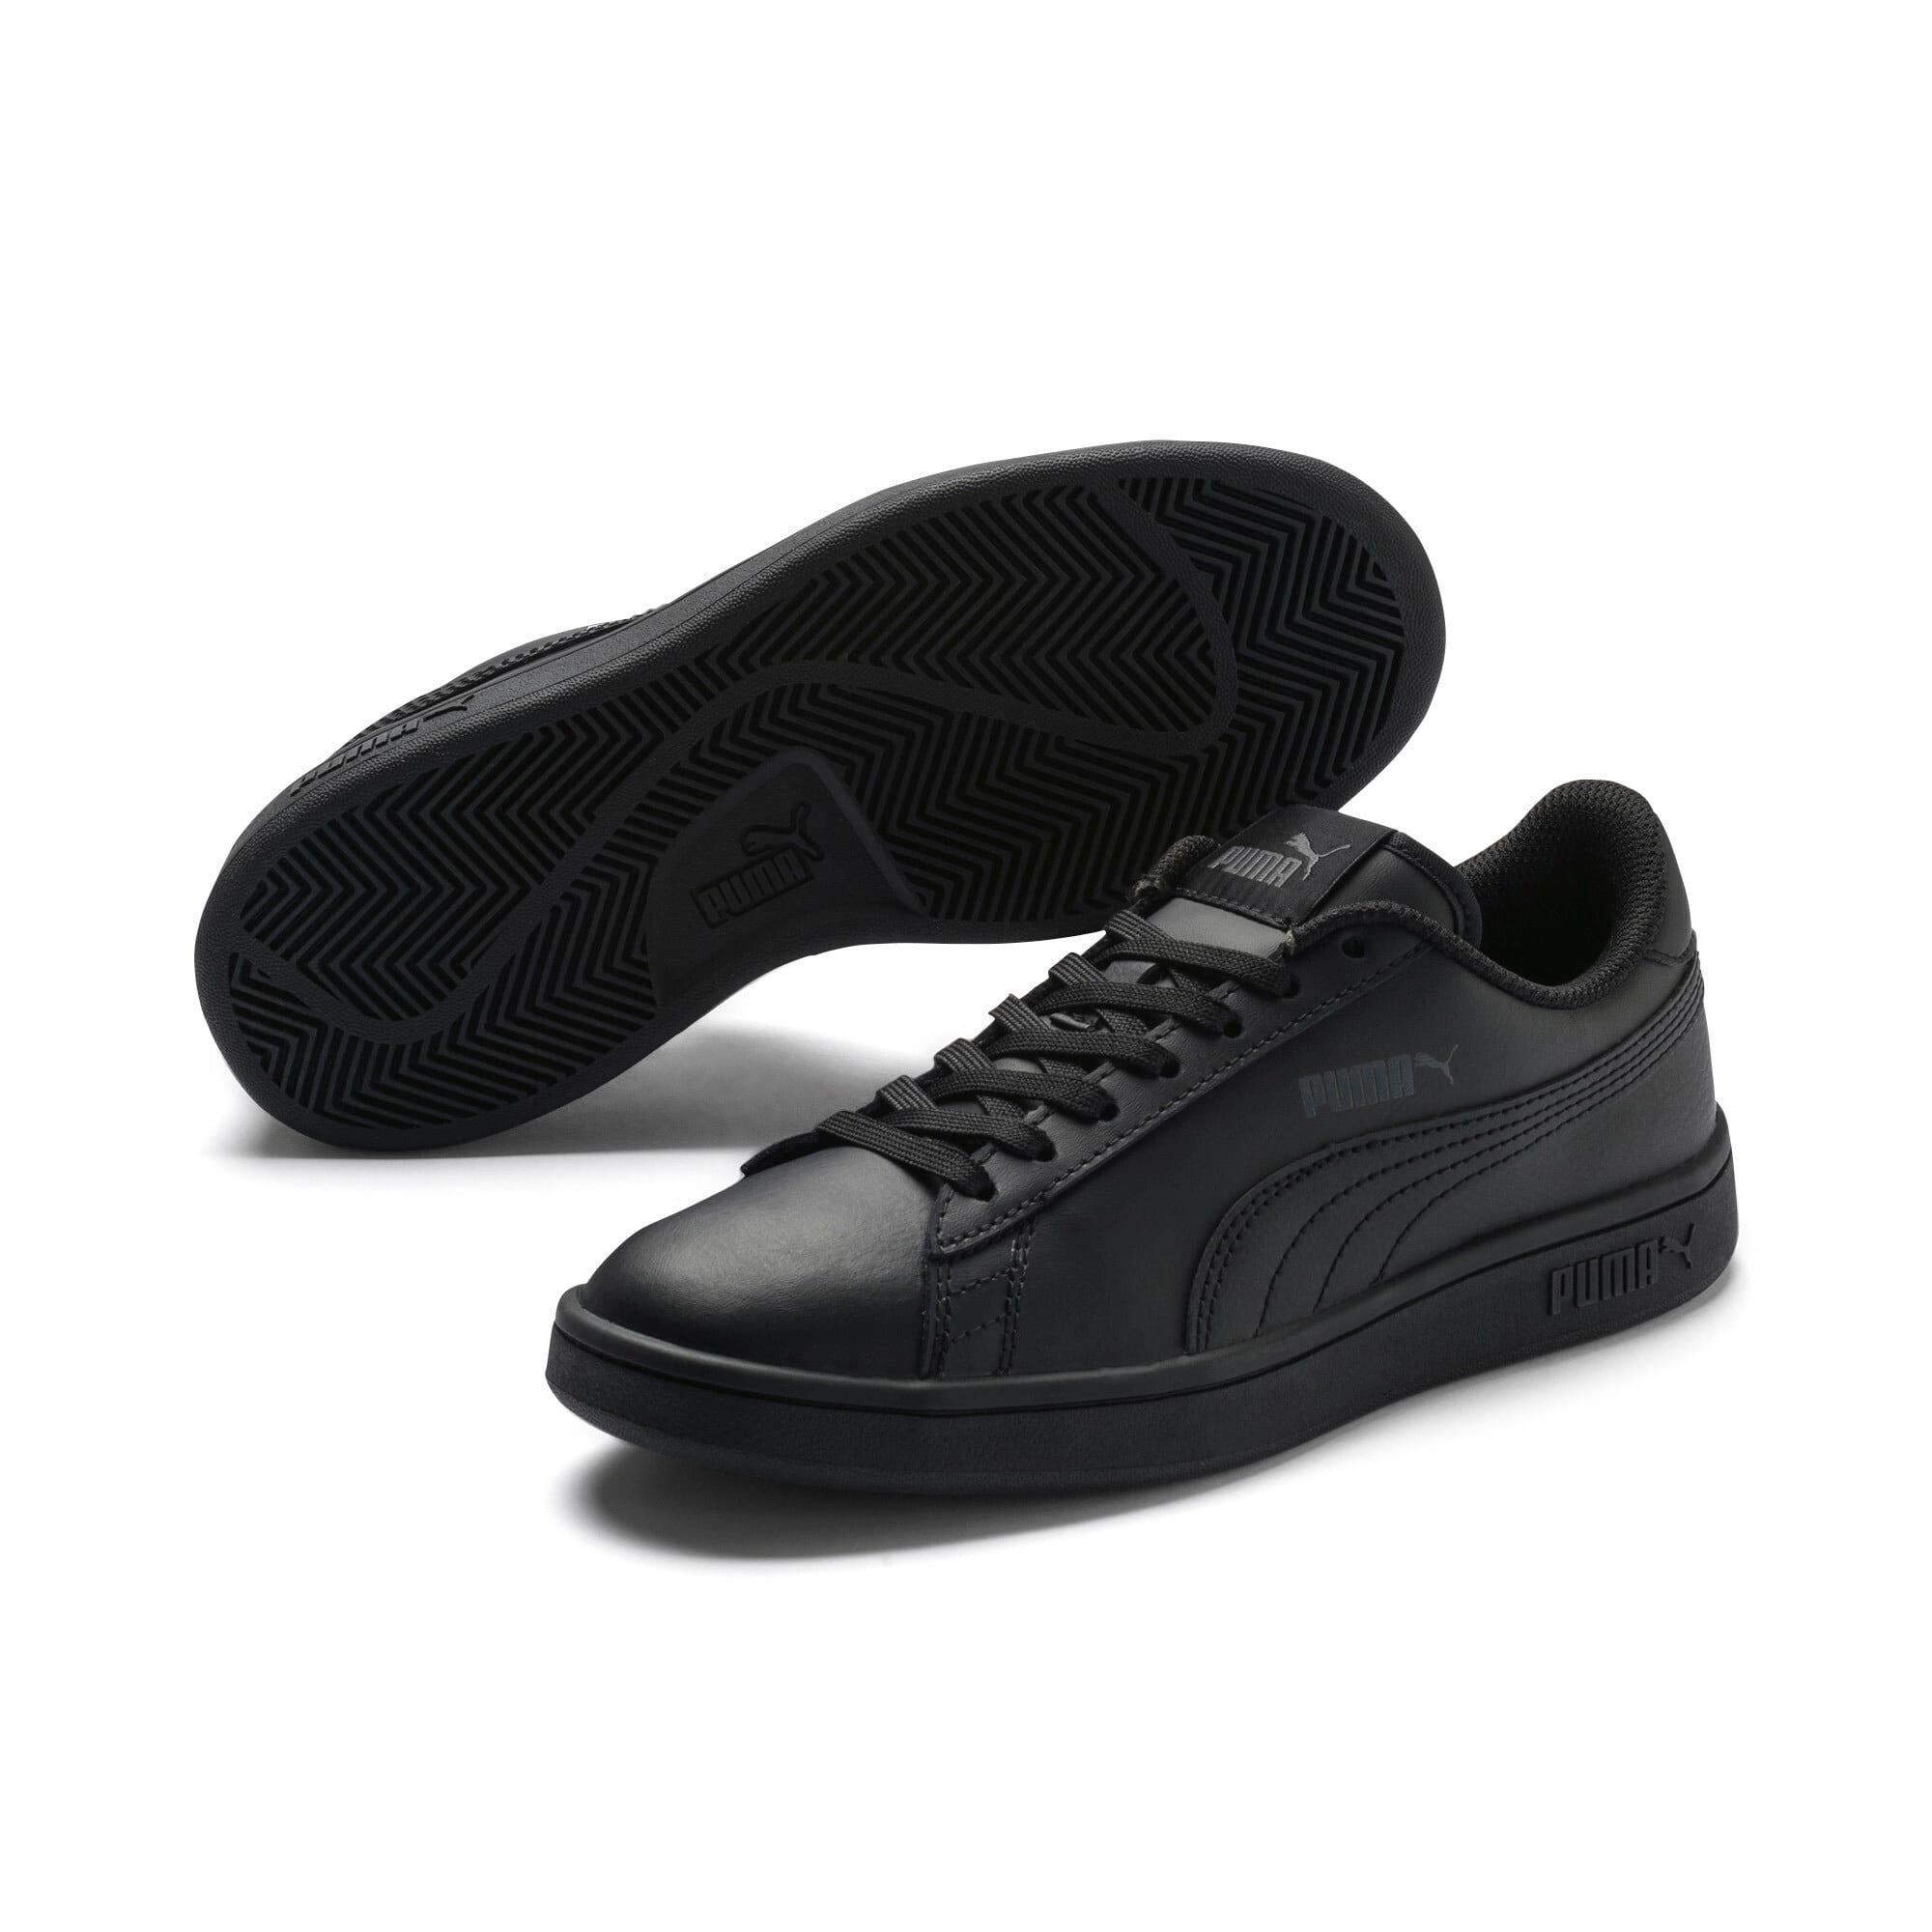 Thumbnail 2 of PUMA Smash v2 Leather Sneakers JR, Puma Black-Puma Black, medium